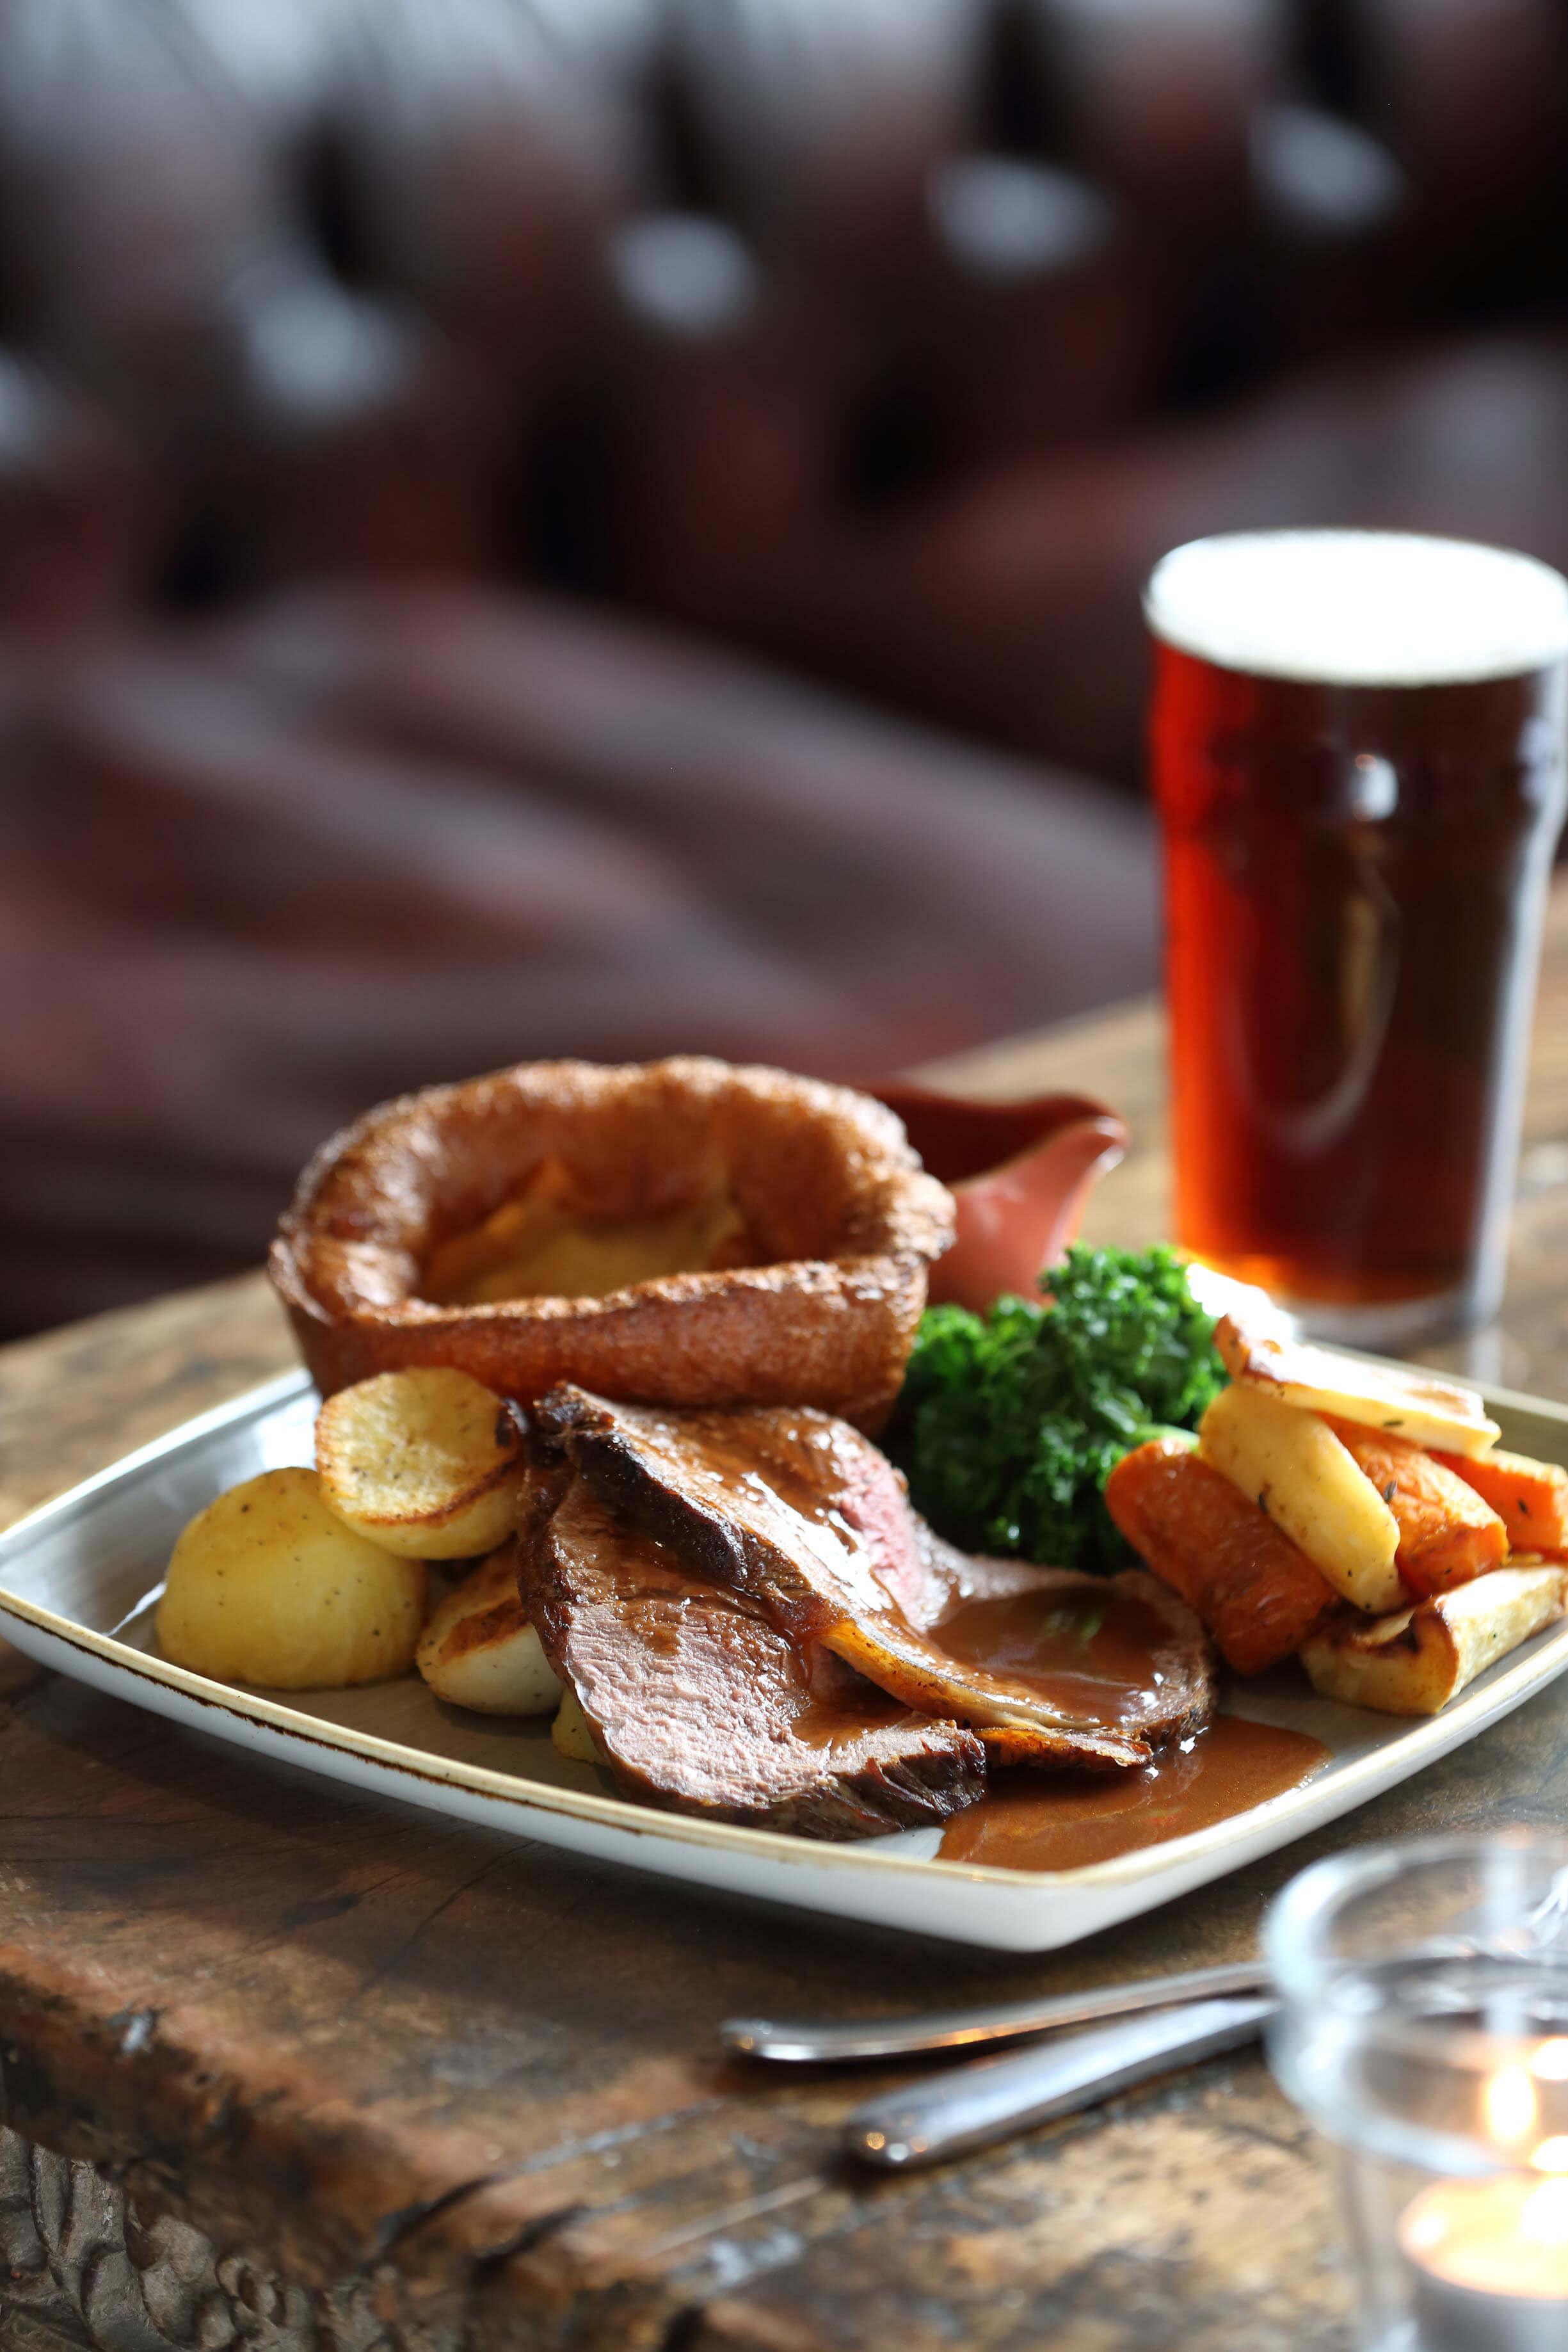 Sunday roast and pint of beer at The North Star pub, Ealing